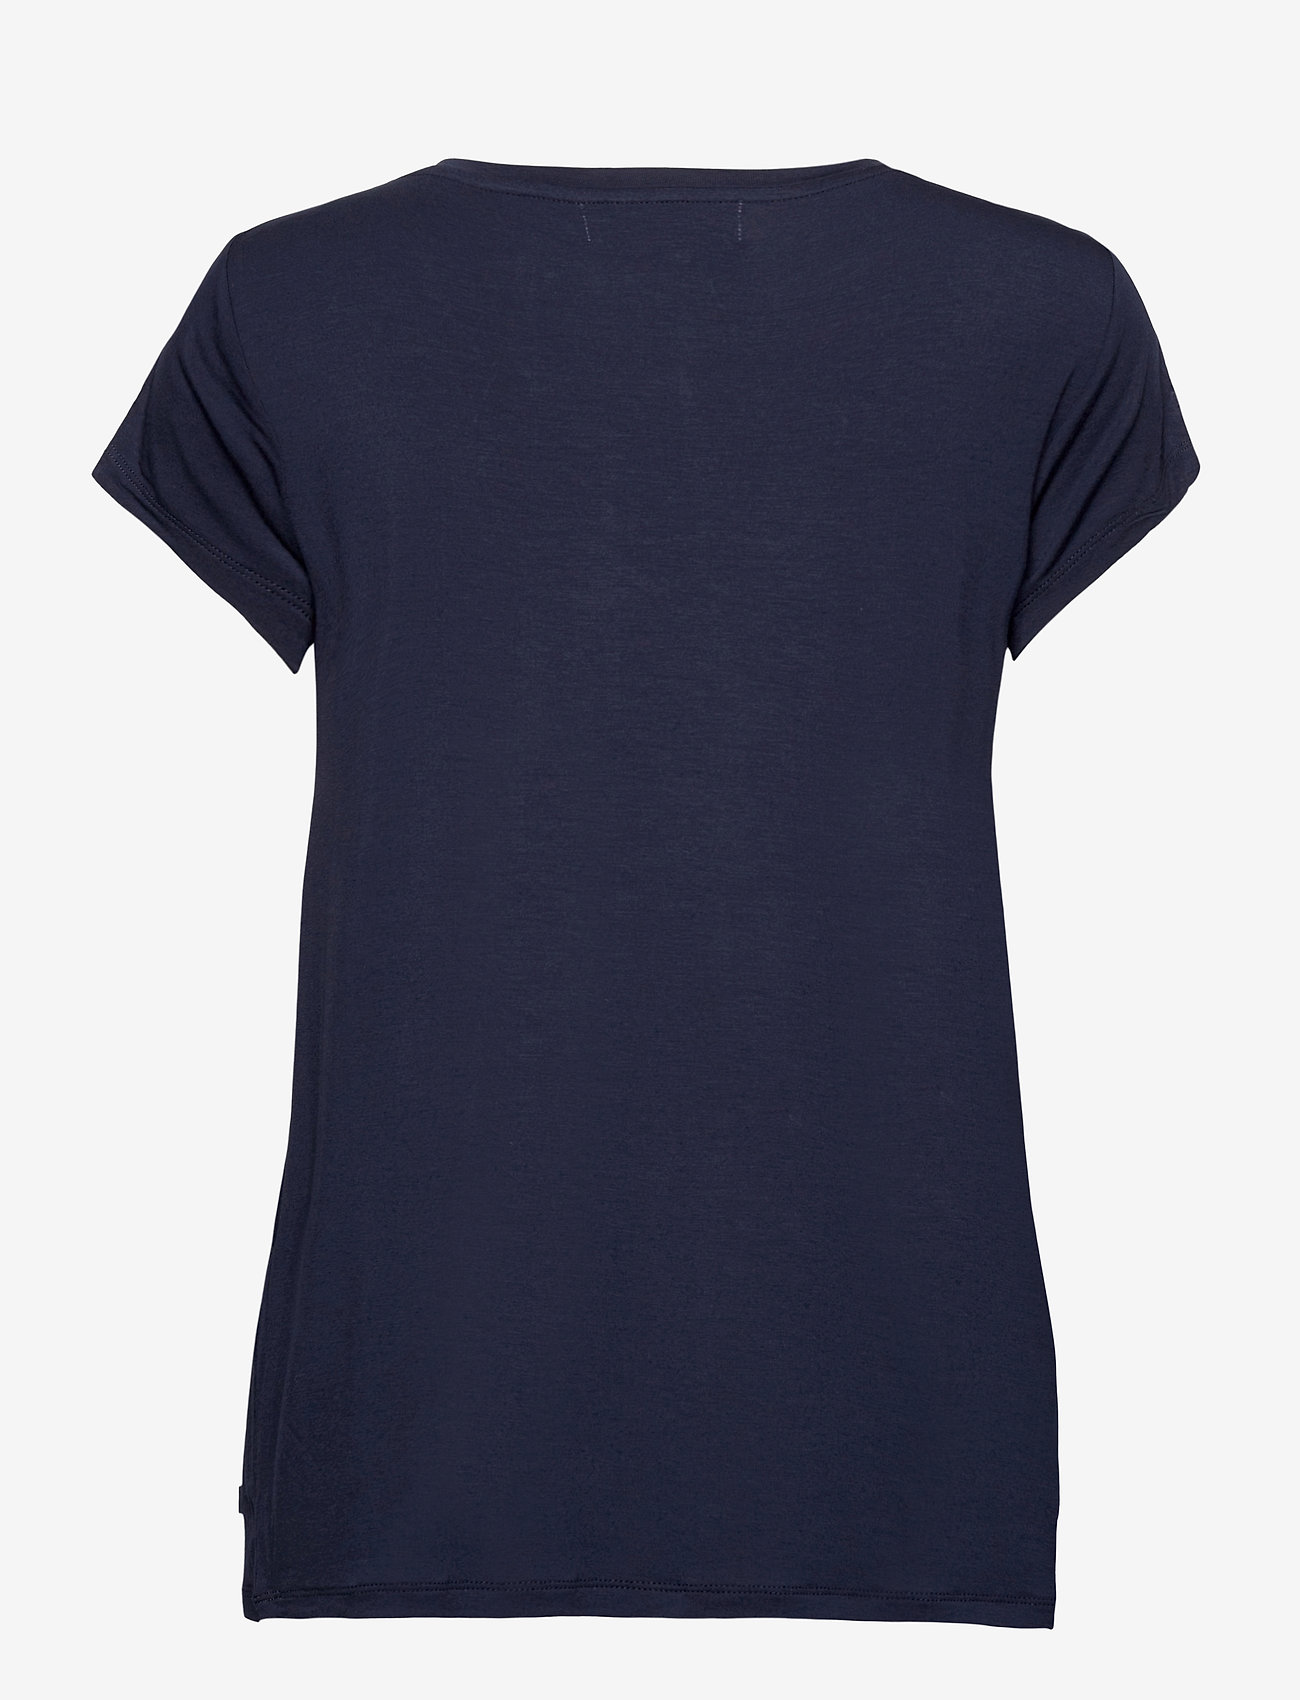 Rosemunde - T-shirt ss - t-shirts - navy - 1